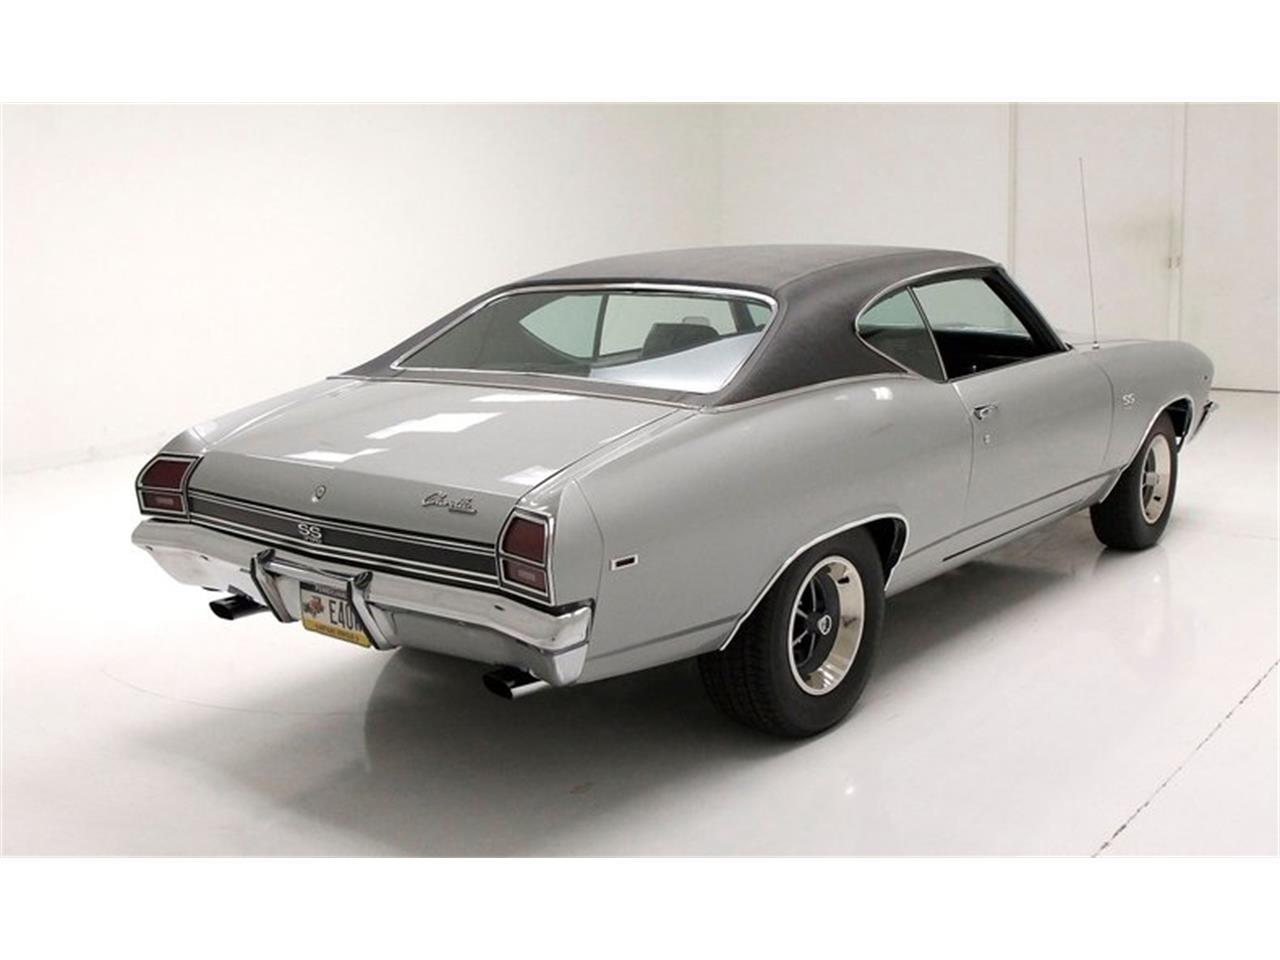 1969 Chevrolet Chevelle Jack Jaw